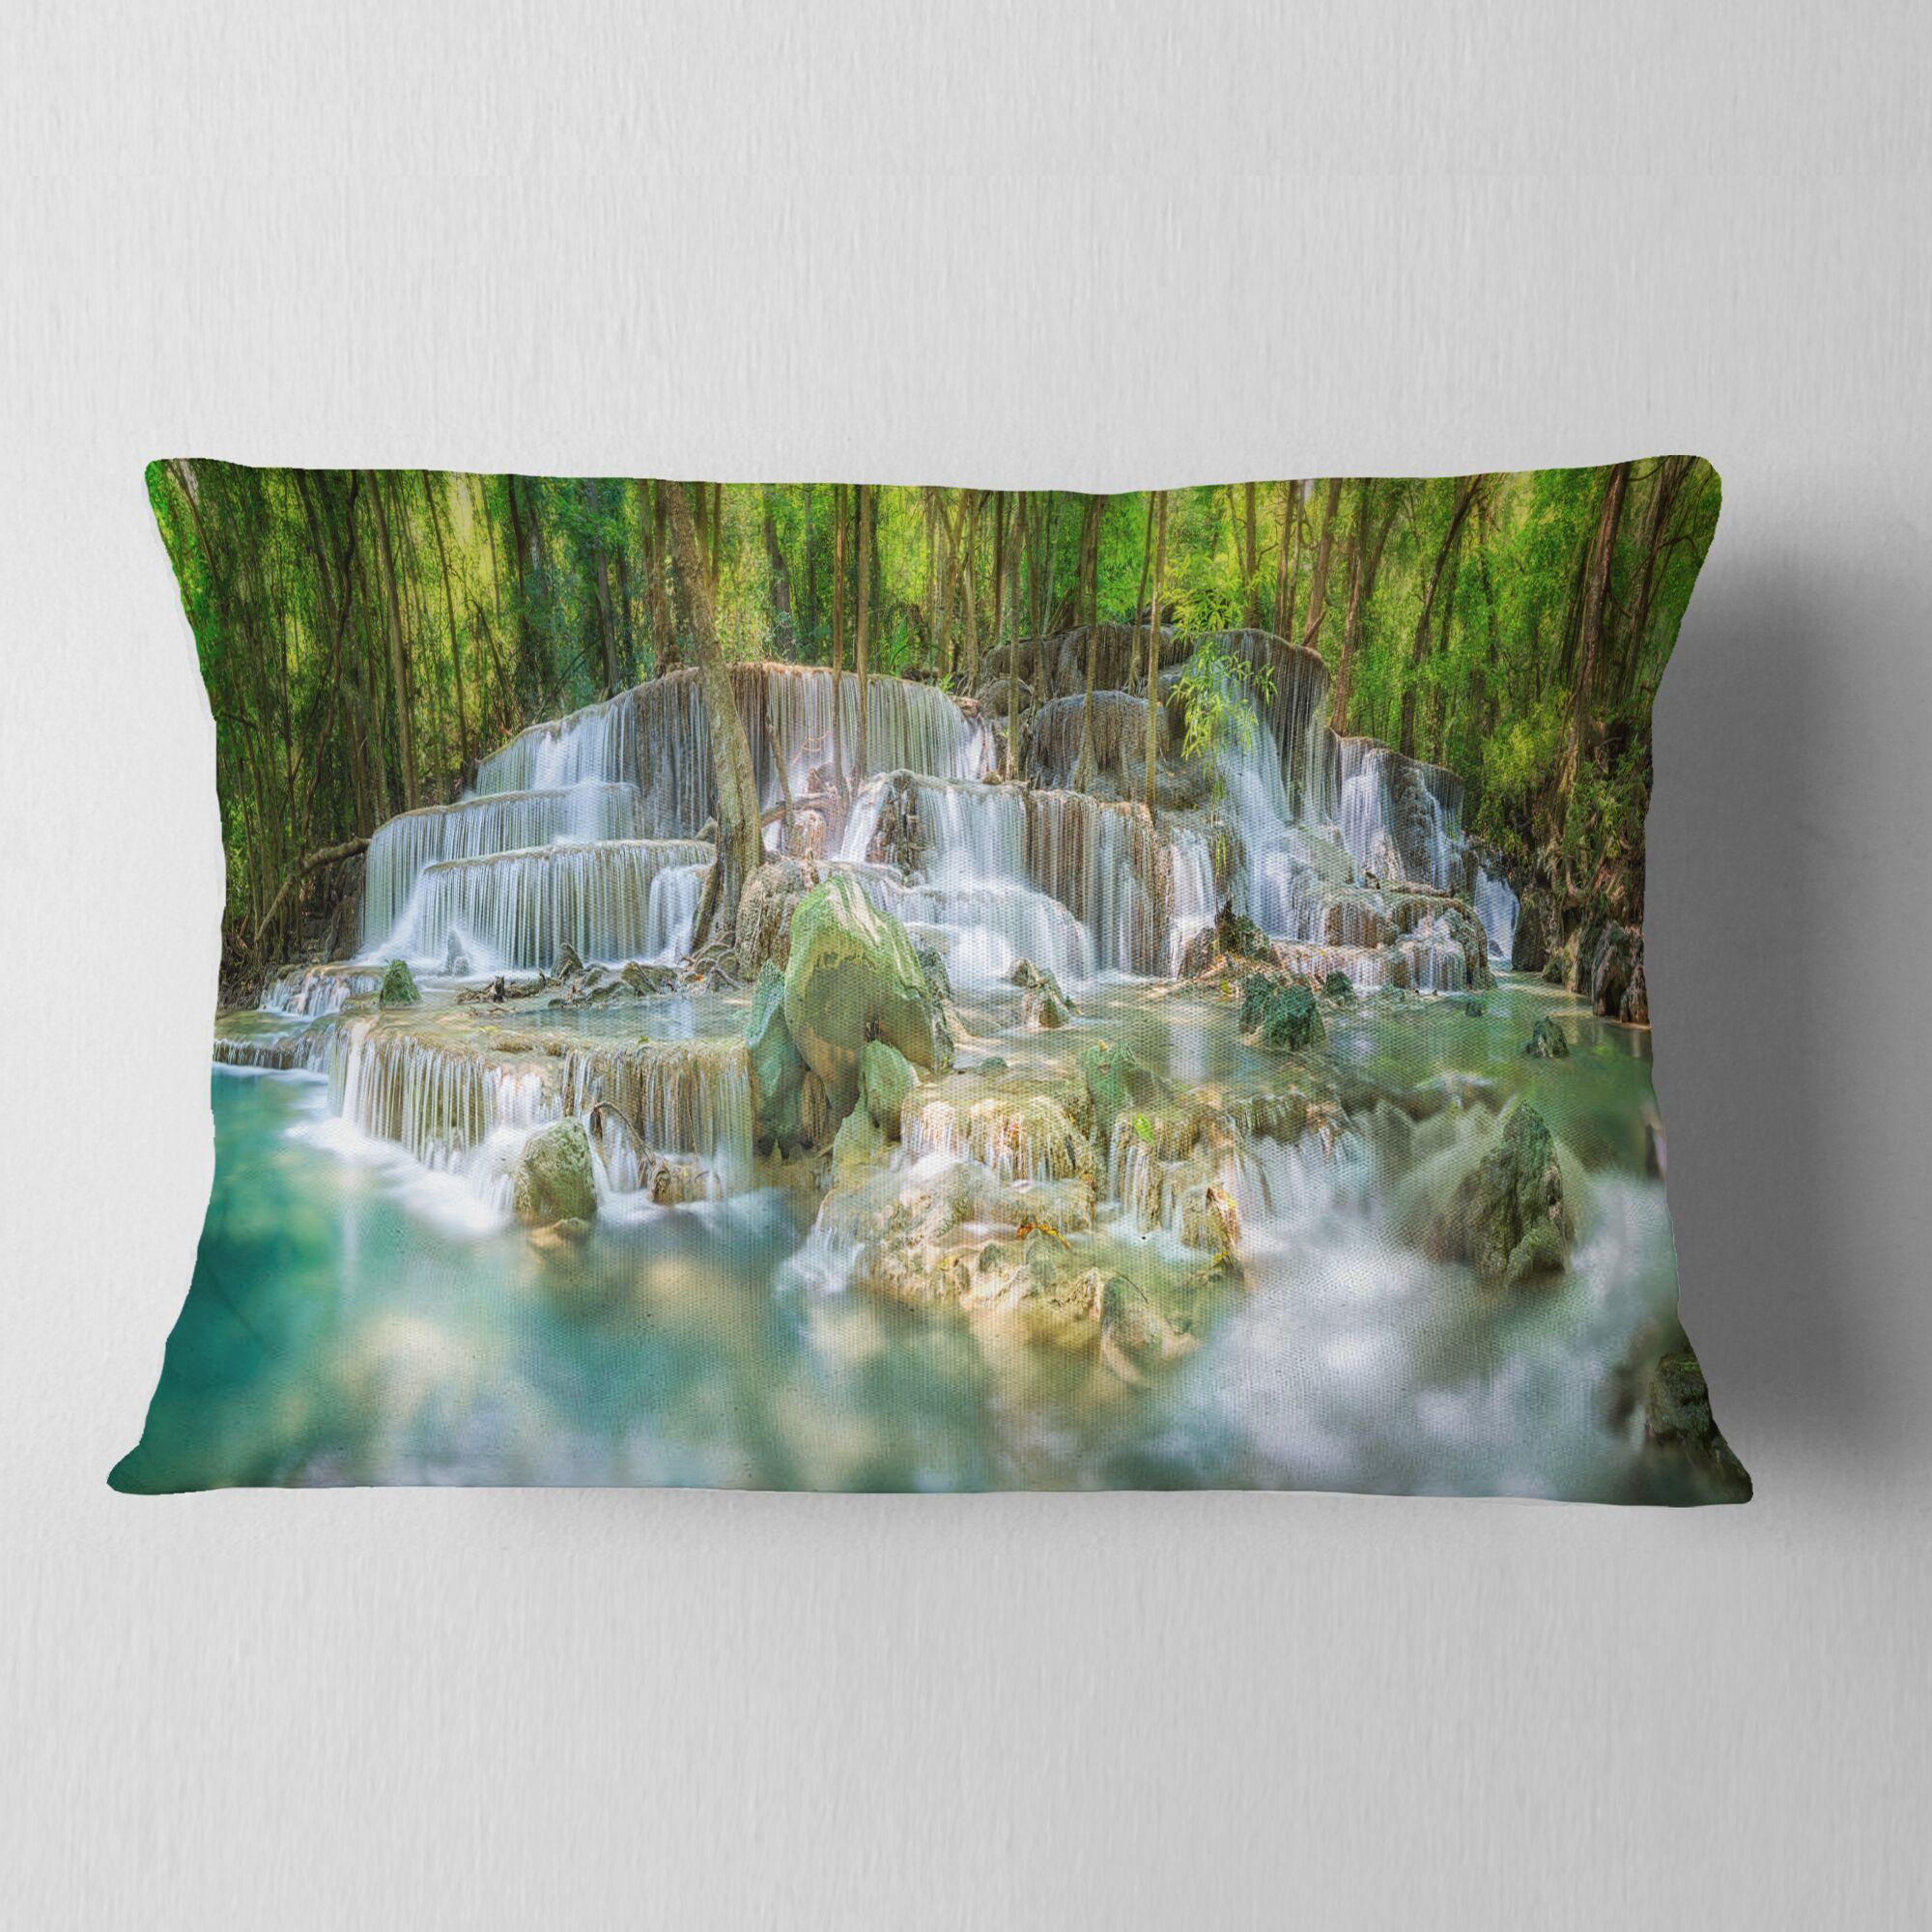 Landscape Printed Level 6 of Huaimaekamin Waterfall Lumbar Pillow